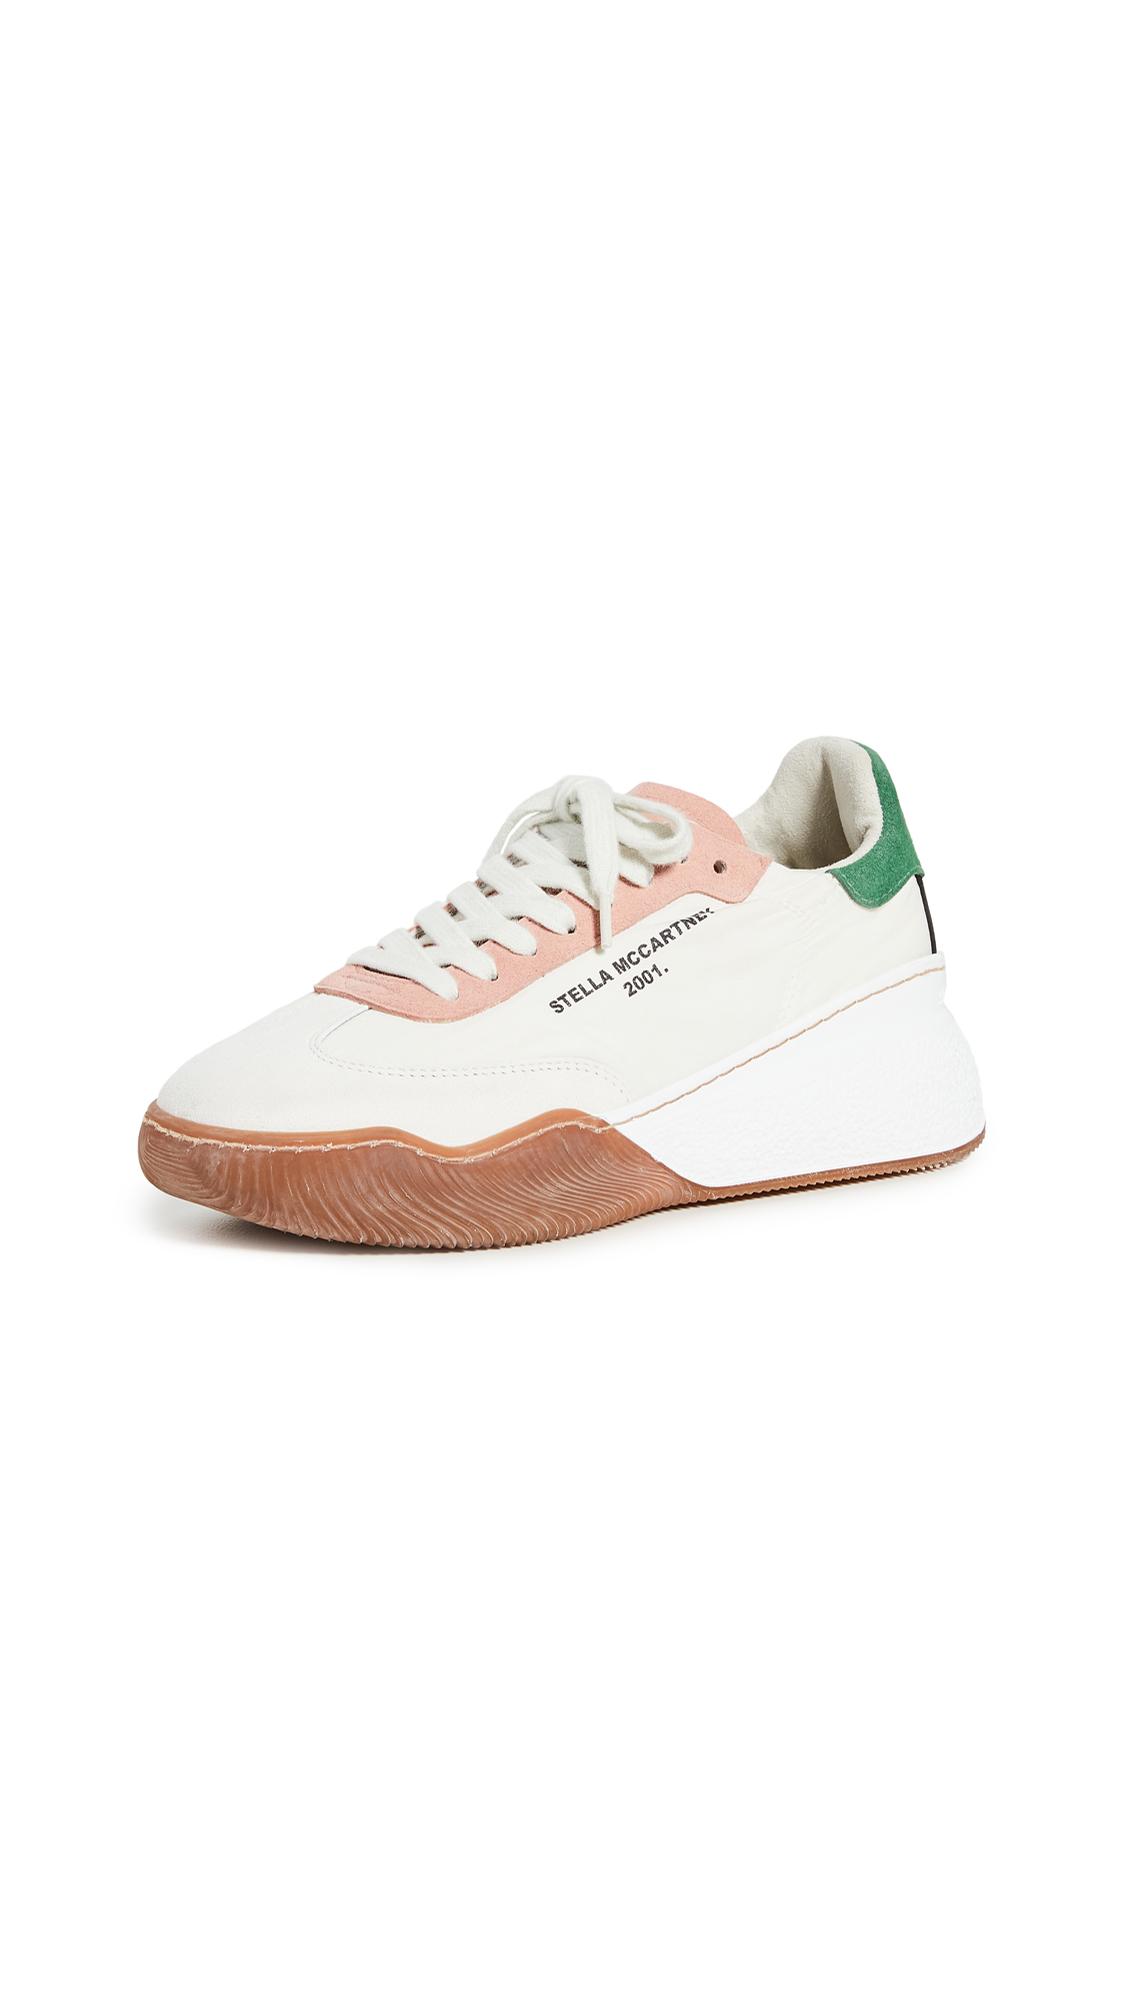 Buy Stella McCartney Loop Lace Up Sneakers online, shop Stella McCartney